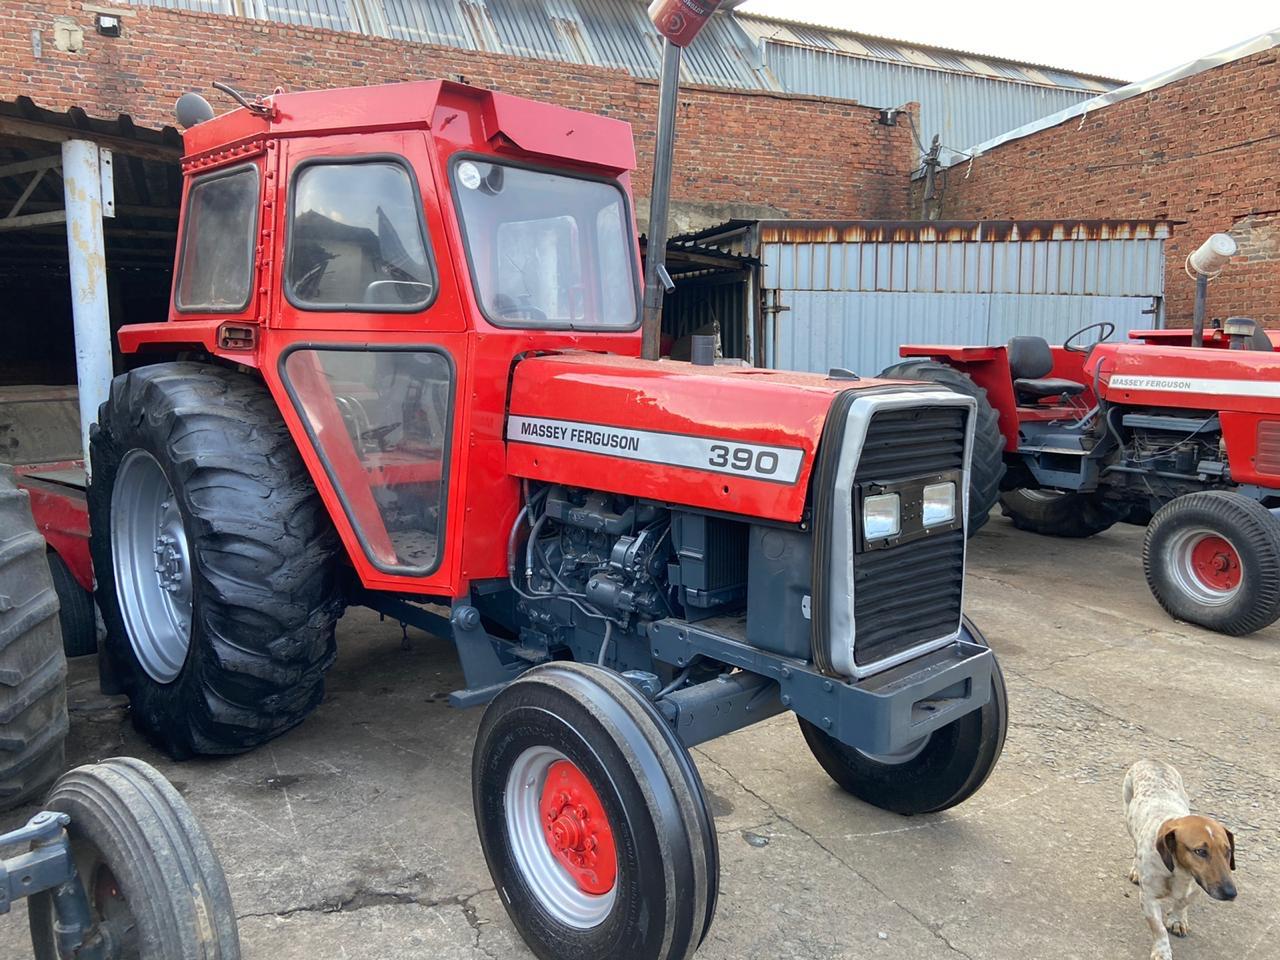 Massey ferguson 390 Cab tractor